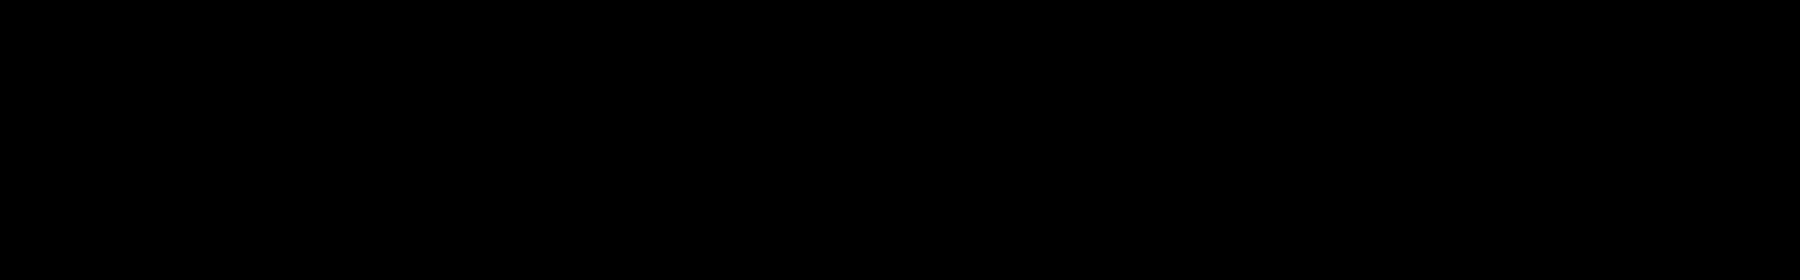 Razor X V1.1 audio waveform